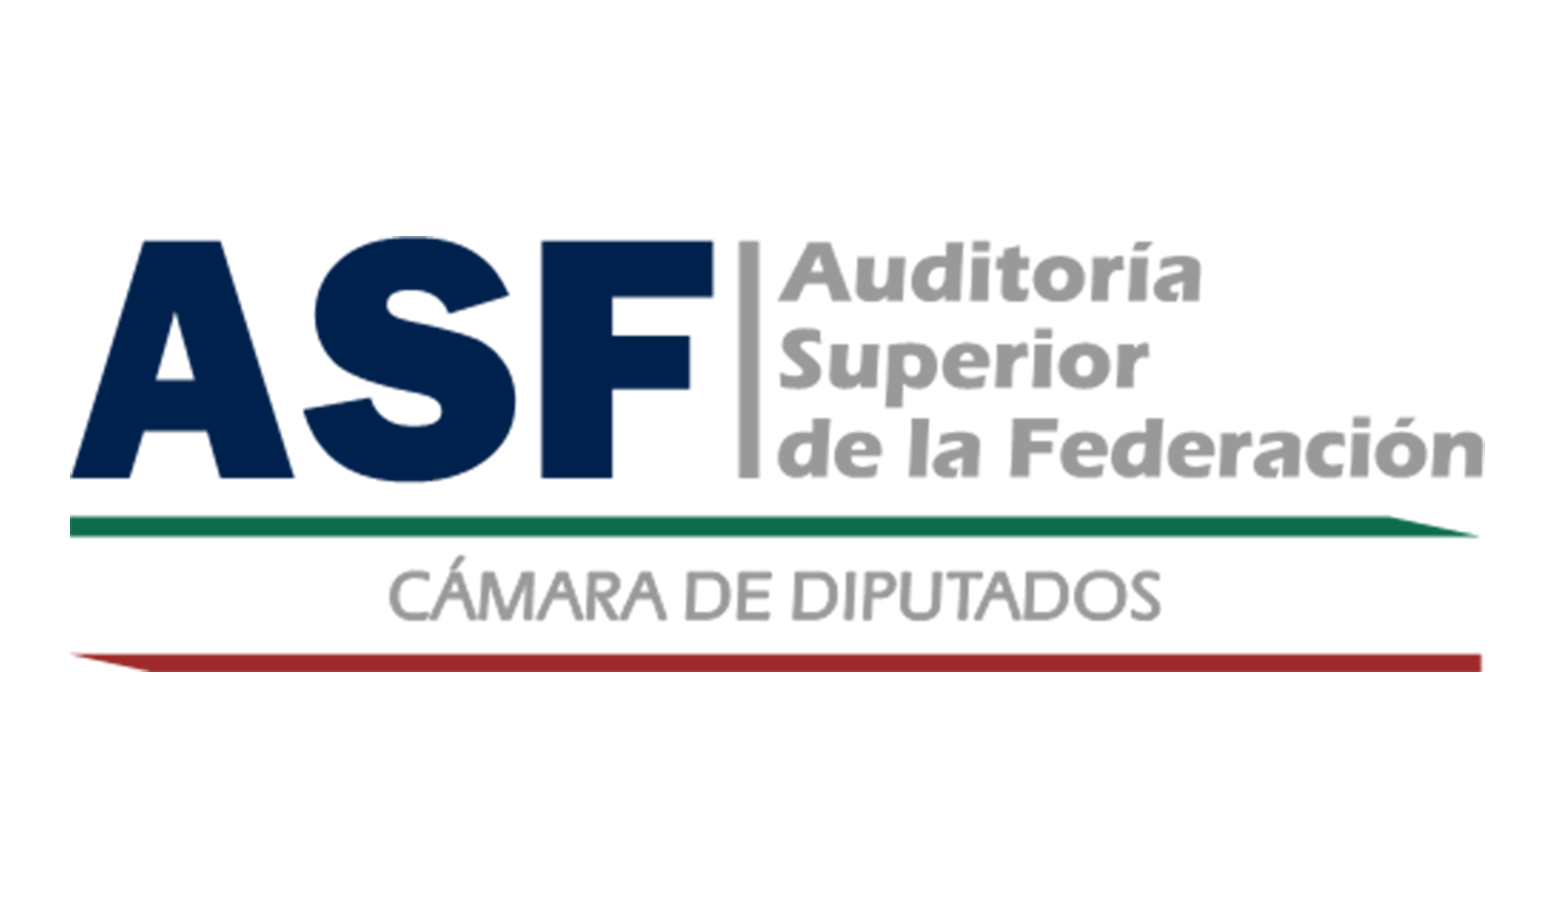 Integran+terna+de+finalistas+para+titular+de+la+Auditor%C3%ADa+Superior